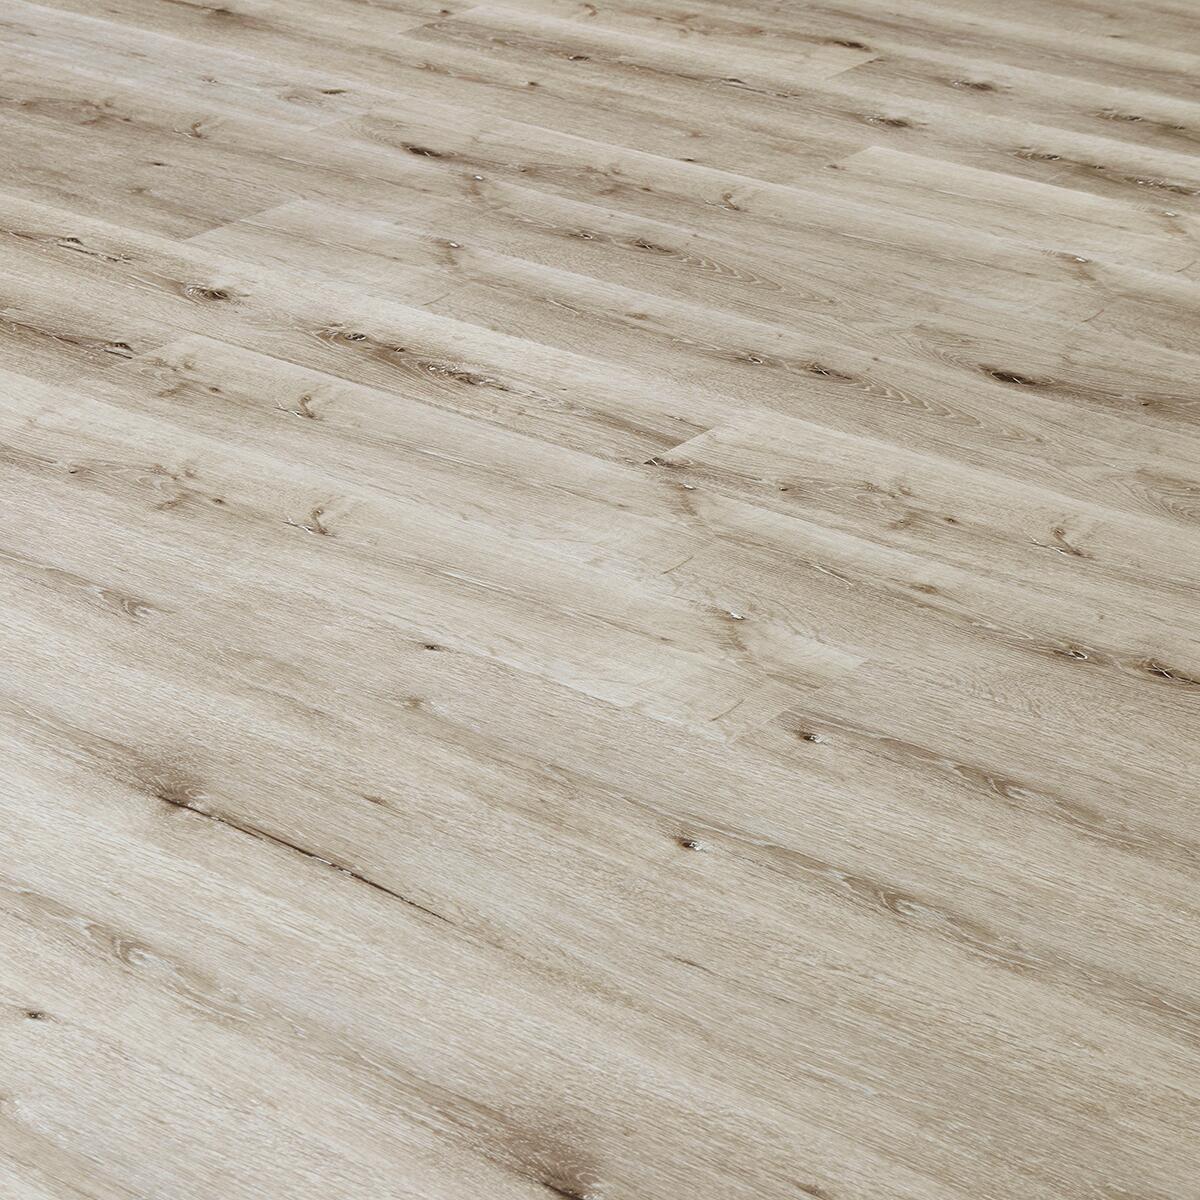 Pavimento SPC flottante clic+ Cannes Sp 4.5 mm grigio / argento - 2